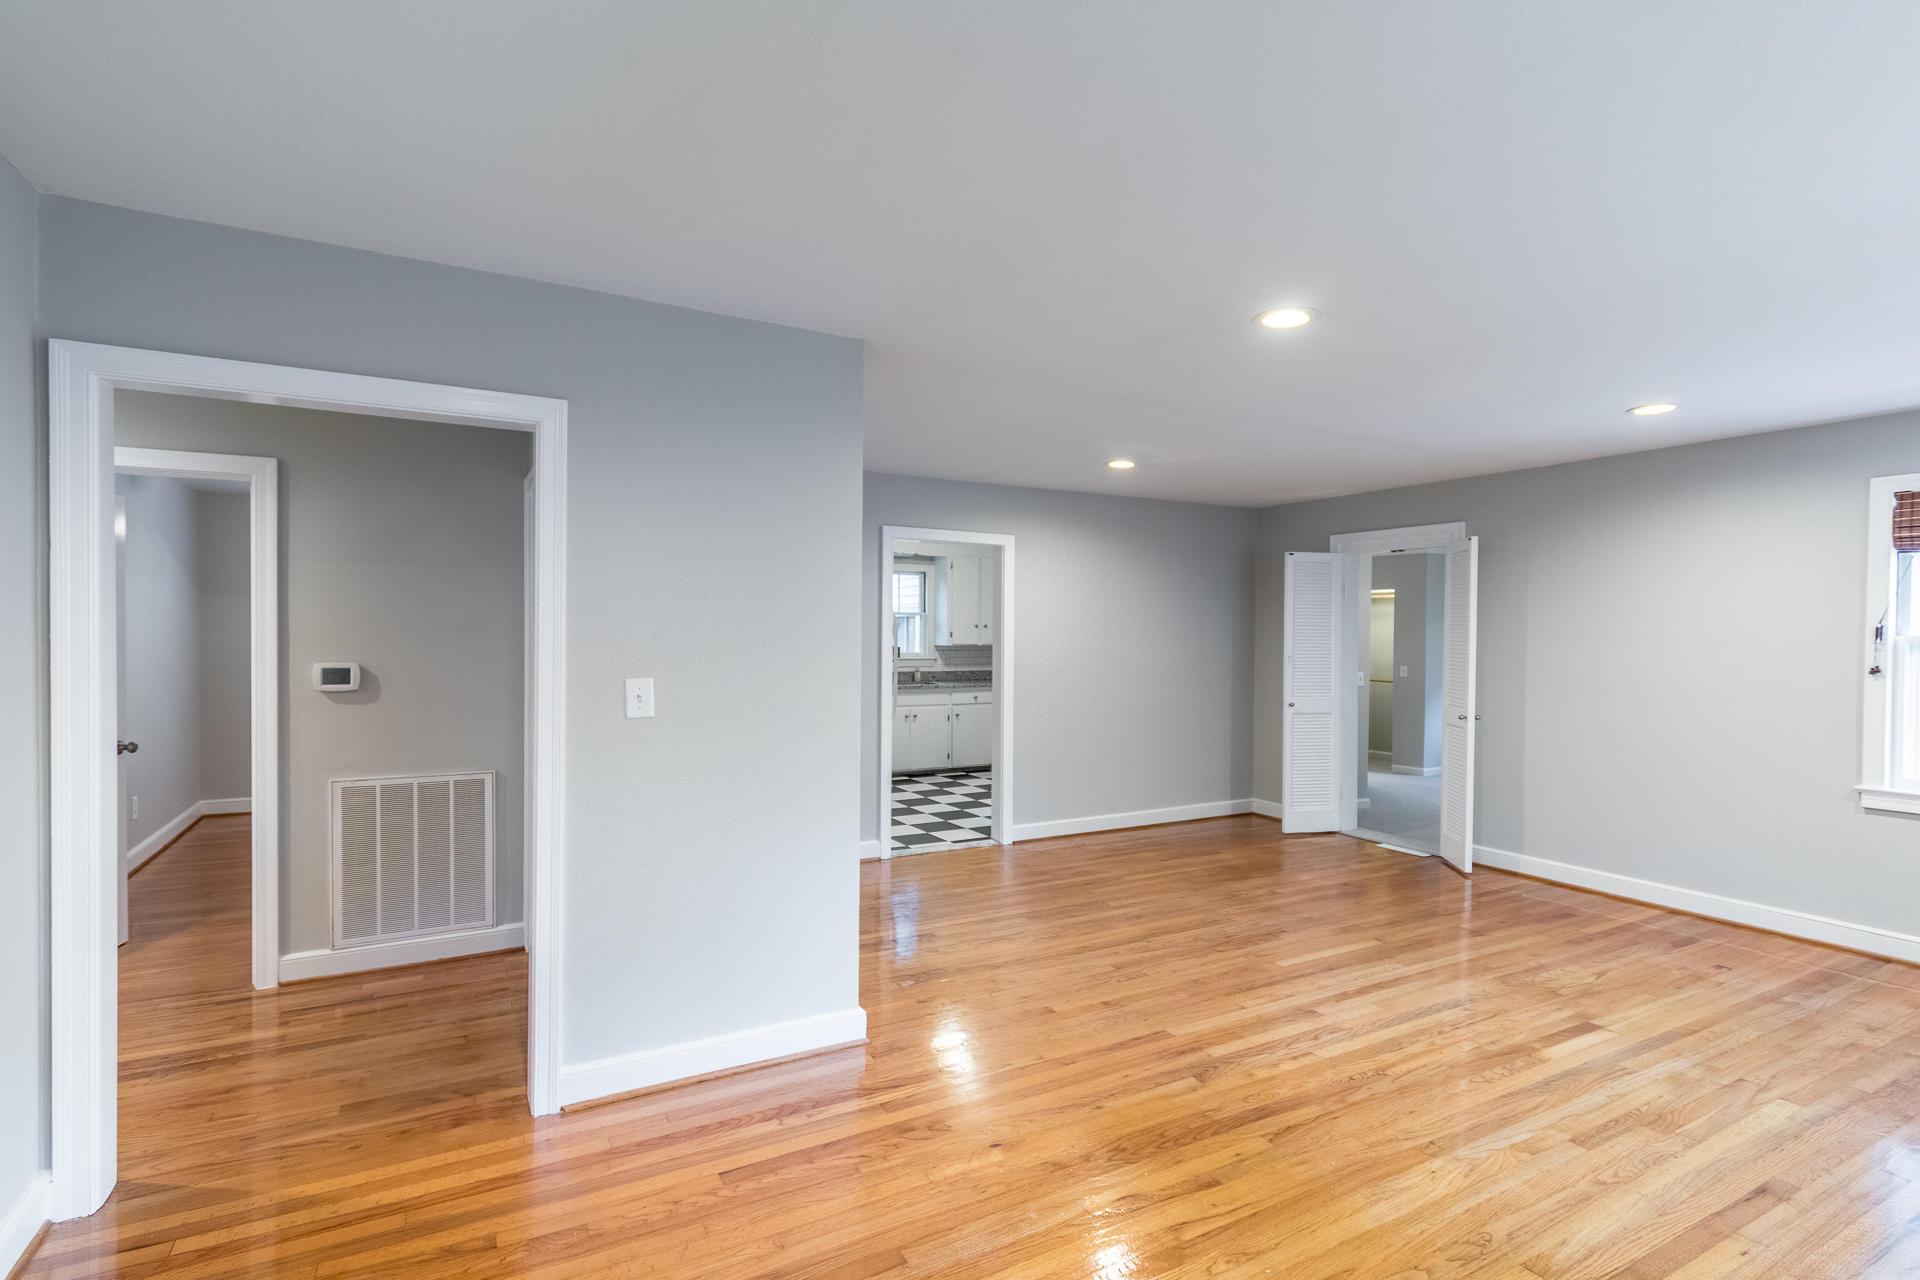 Edgewood Gardens Homes For Sale - 507 Risher, Charleston, SC - 12